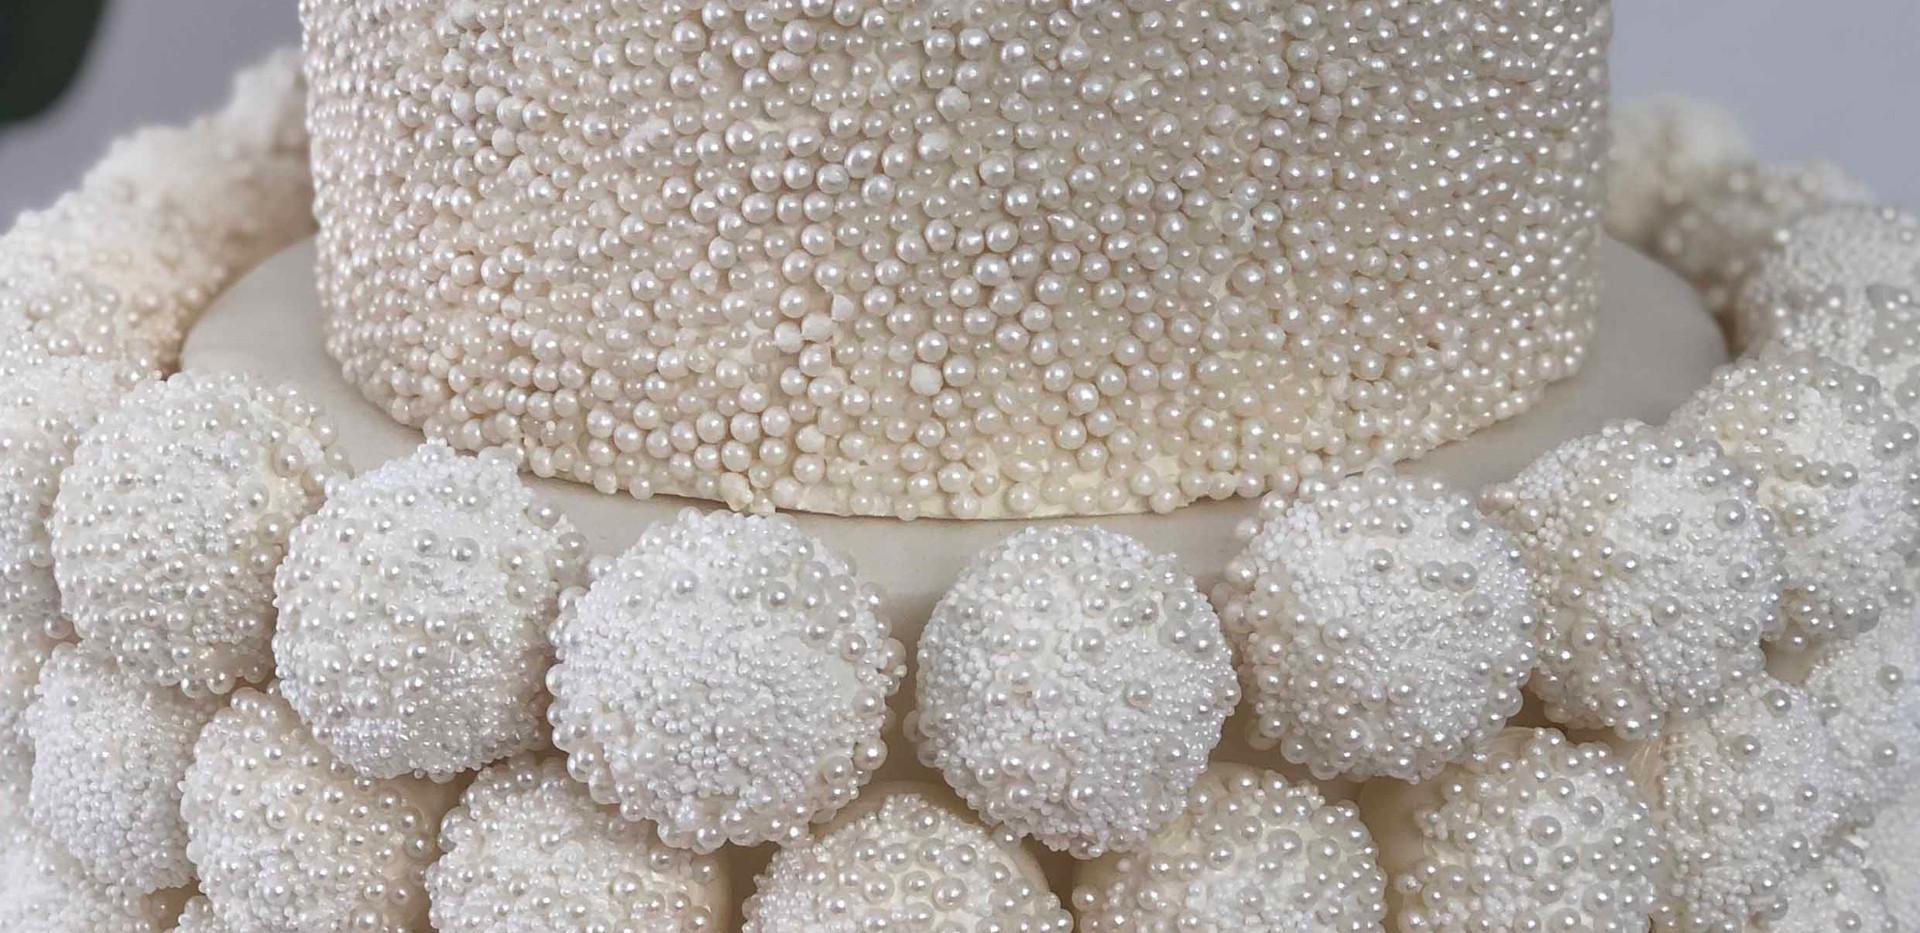 Pearl Drip Wedding Cake Image 5 with Log